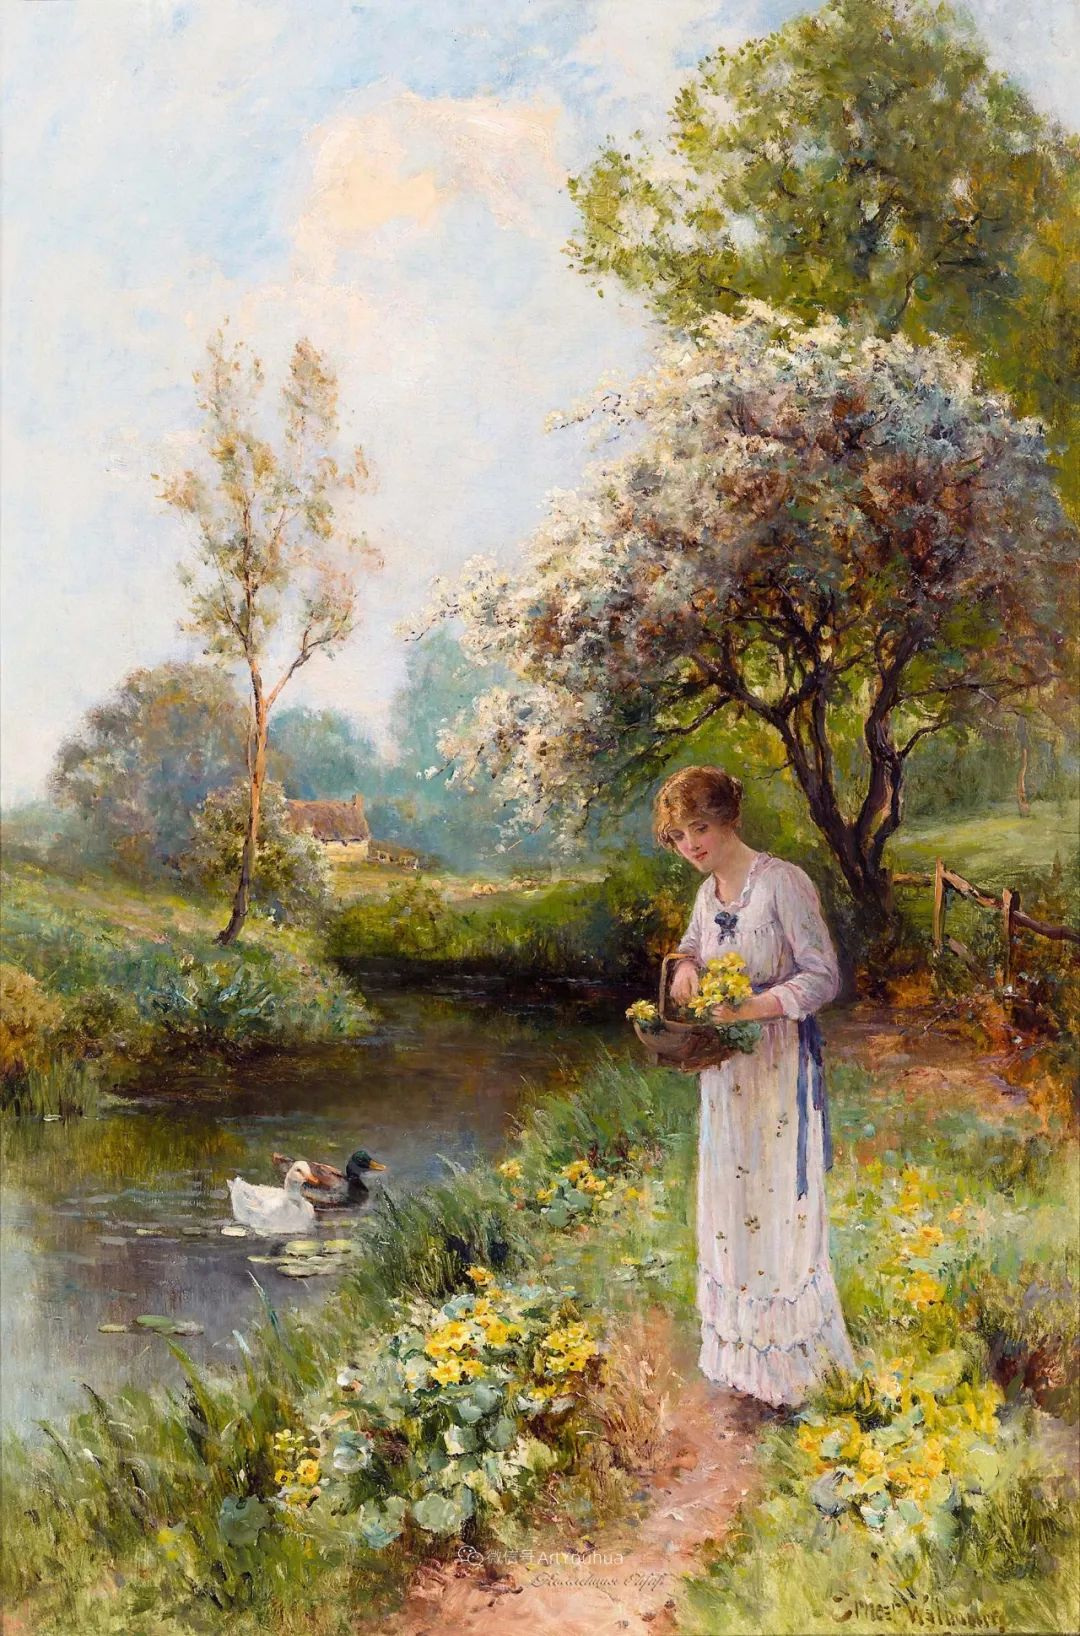 美丽村姑与诗意田园,英国画家Ernest Charles Walbourn作品(下)插图5